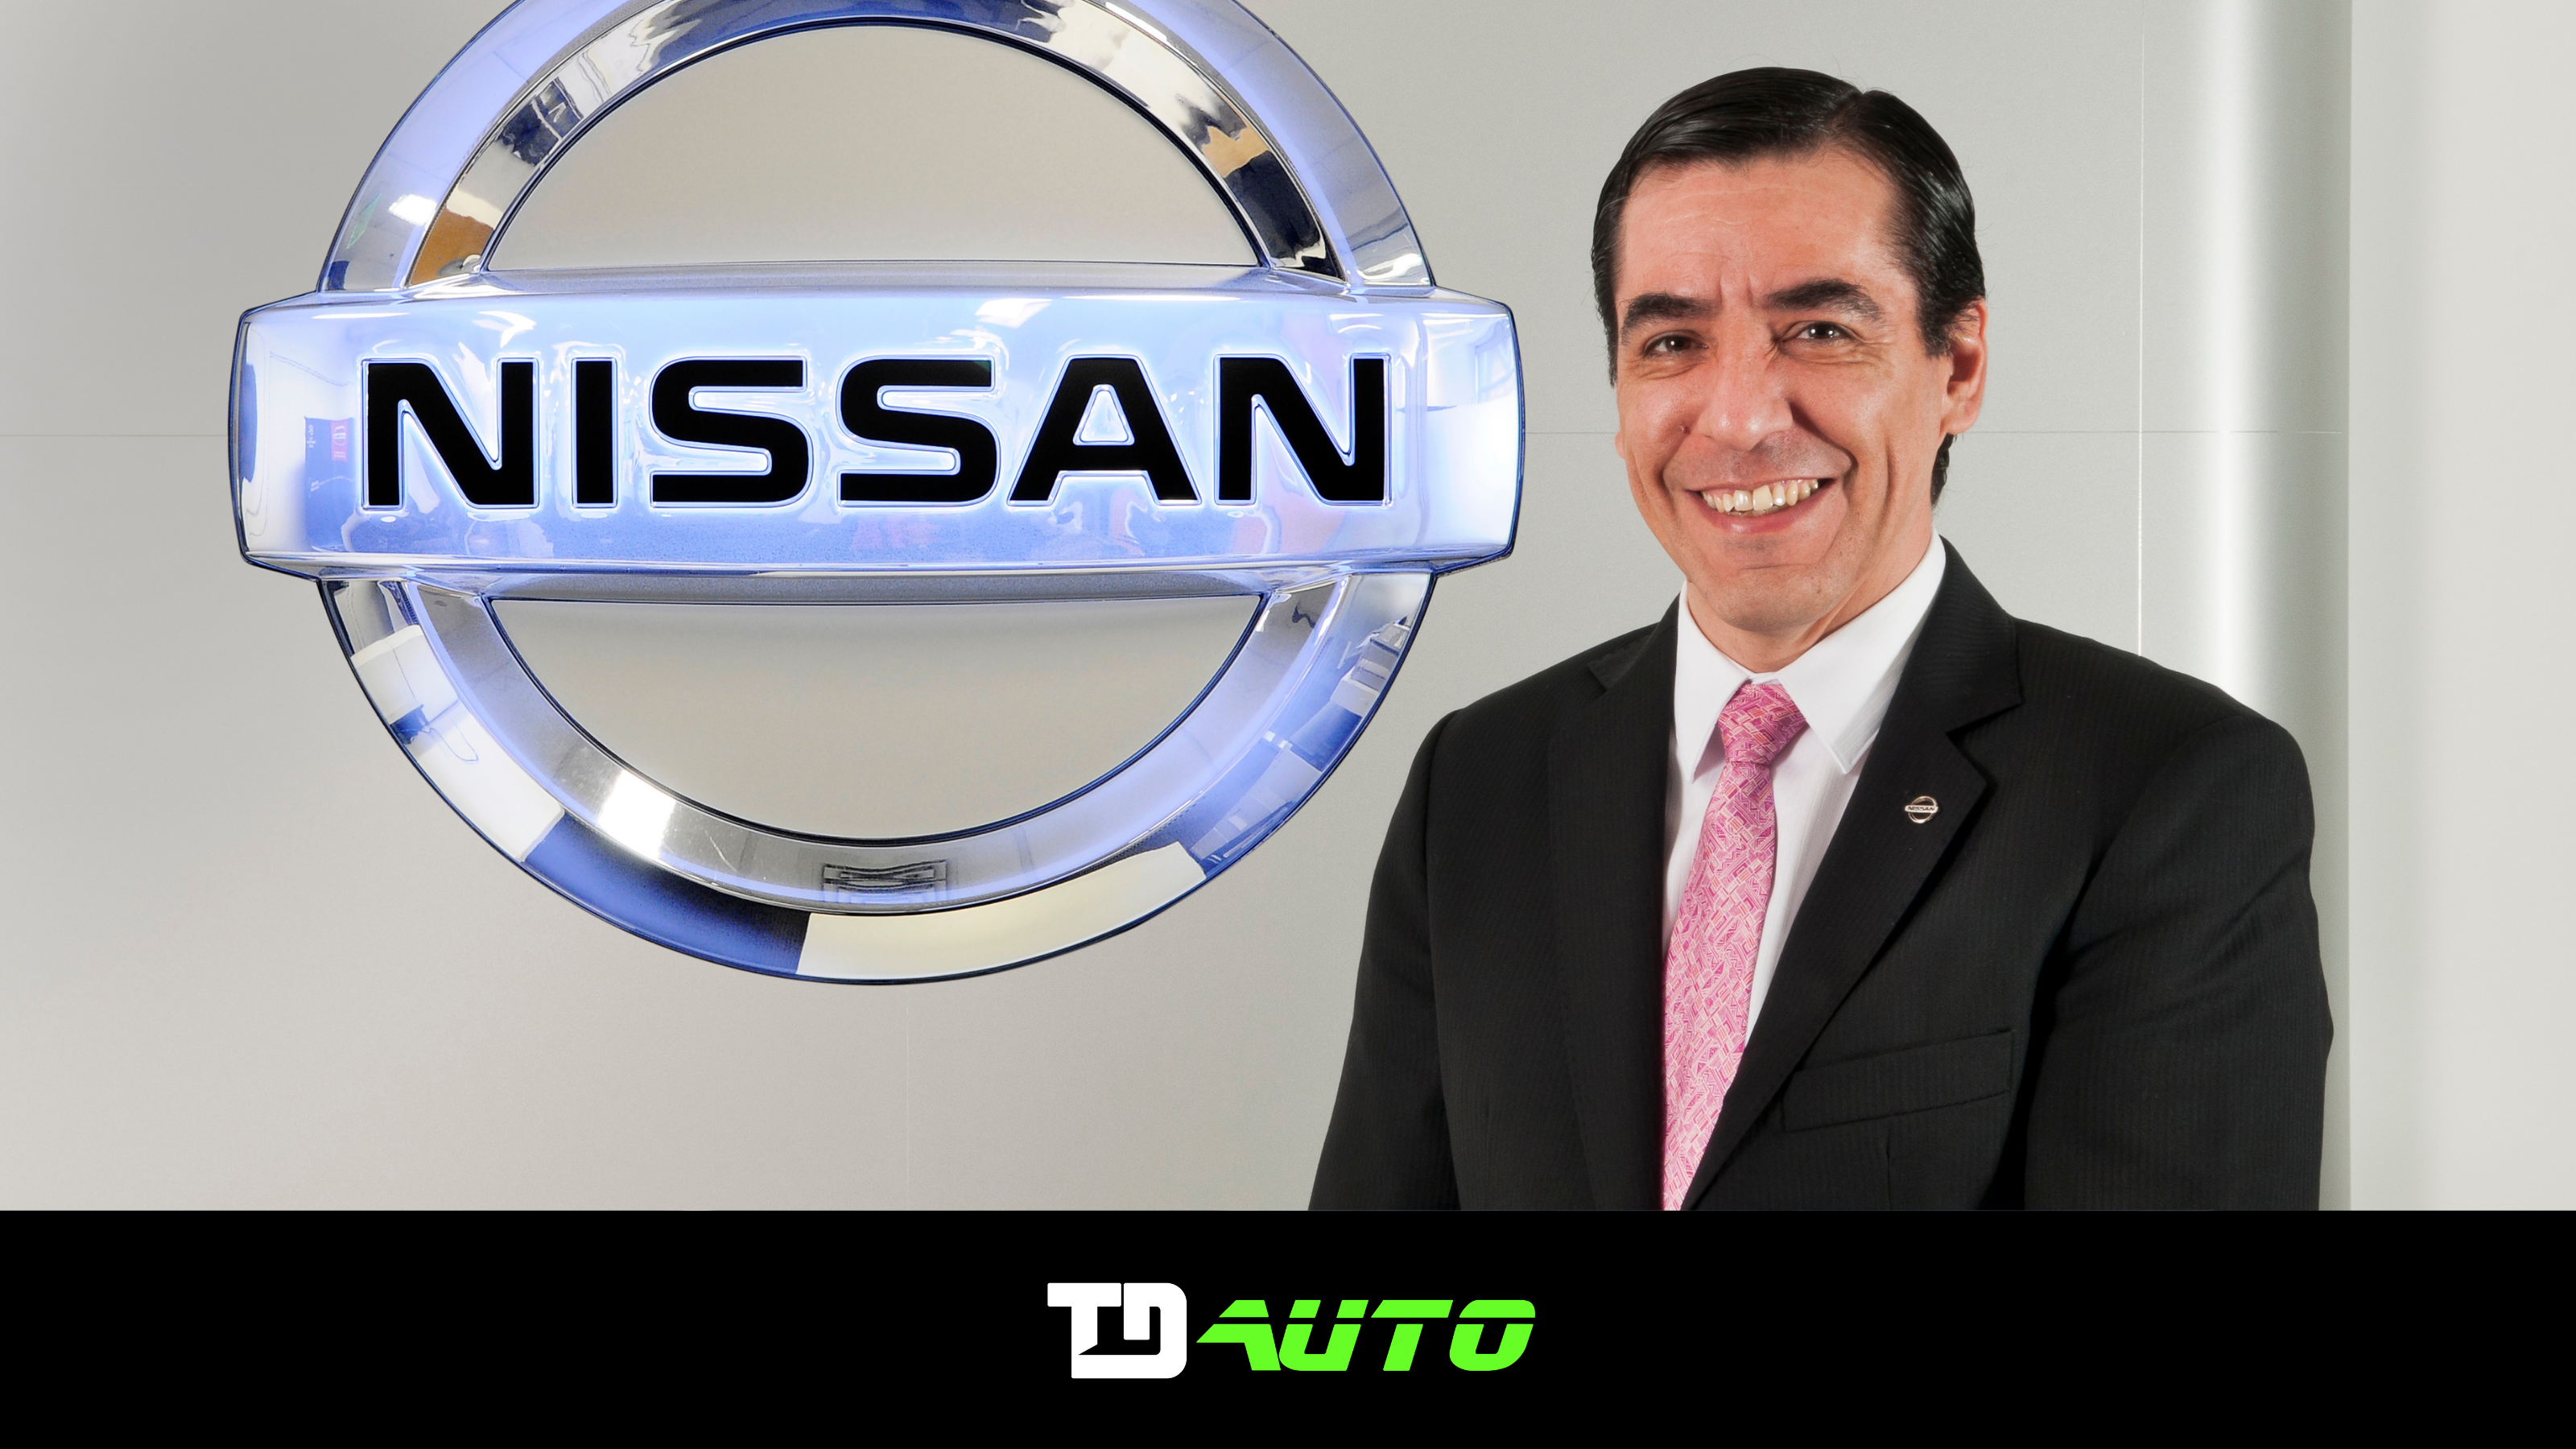 Humberto Gómez (Diretor de Marketing - Nissan Brasil)